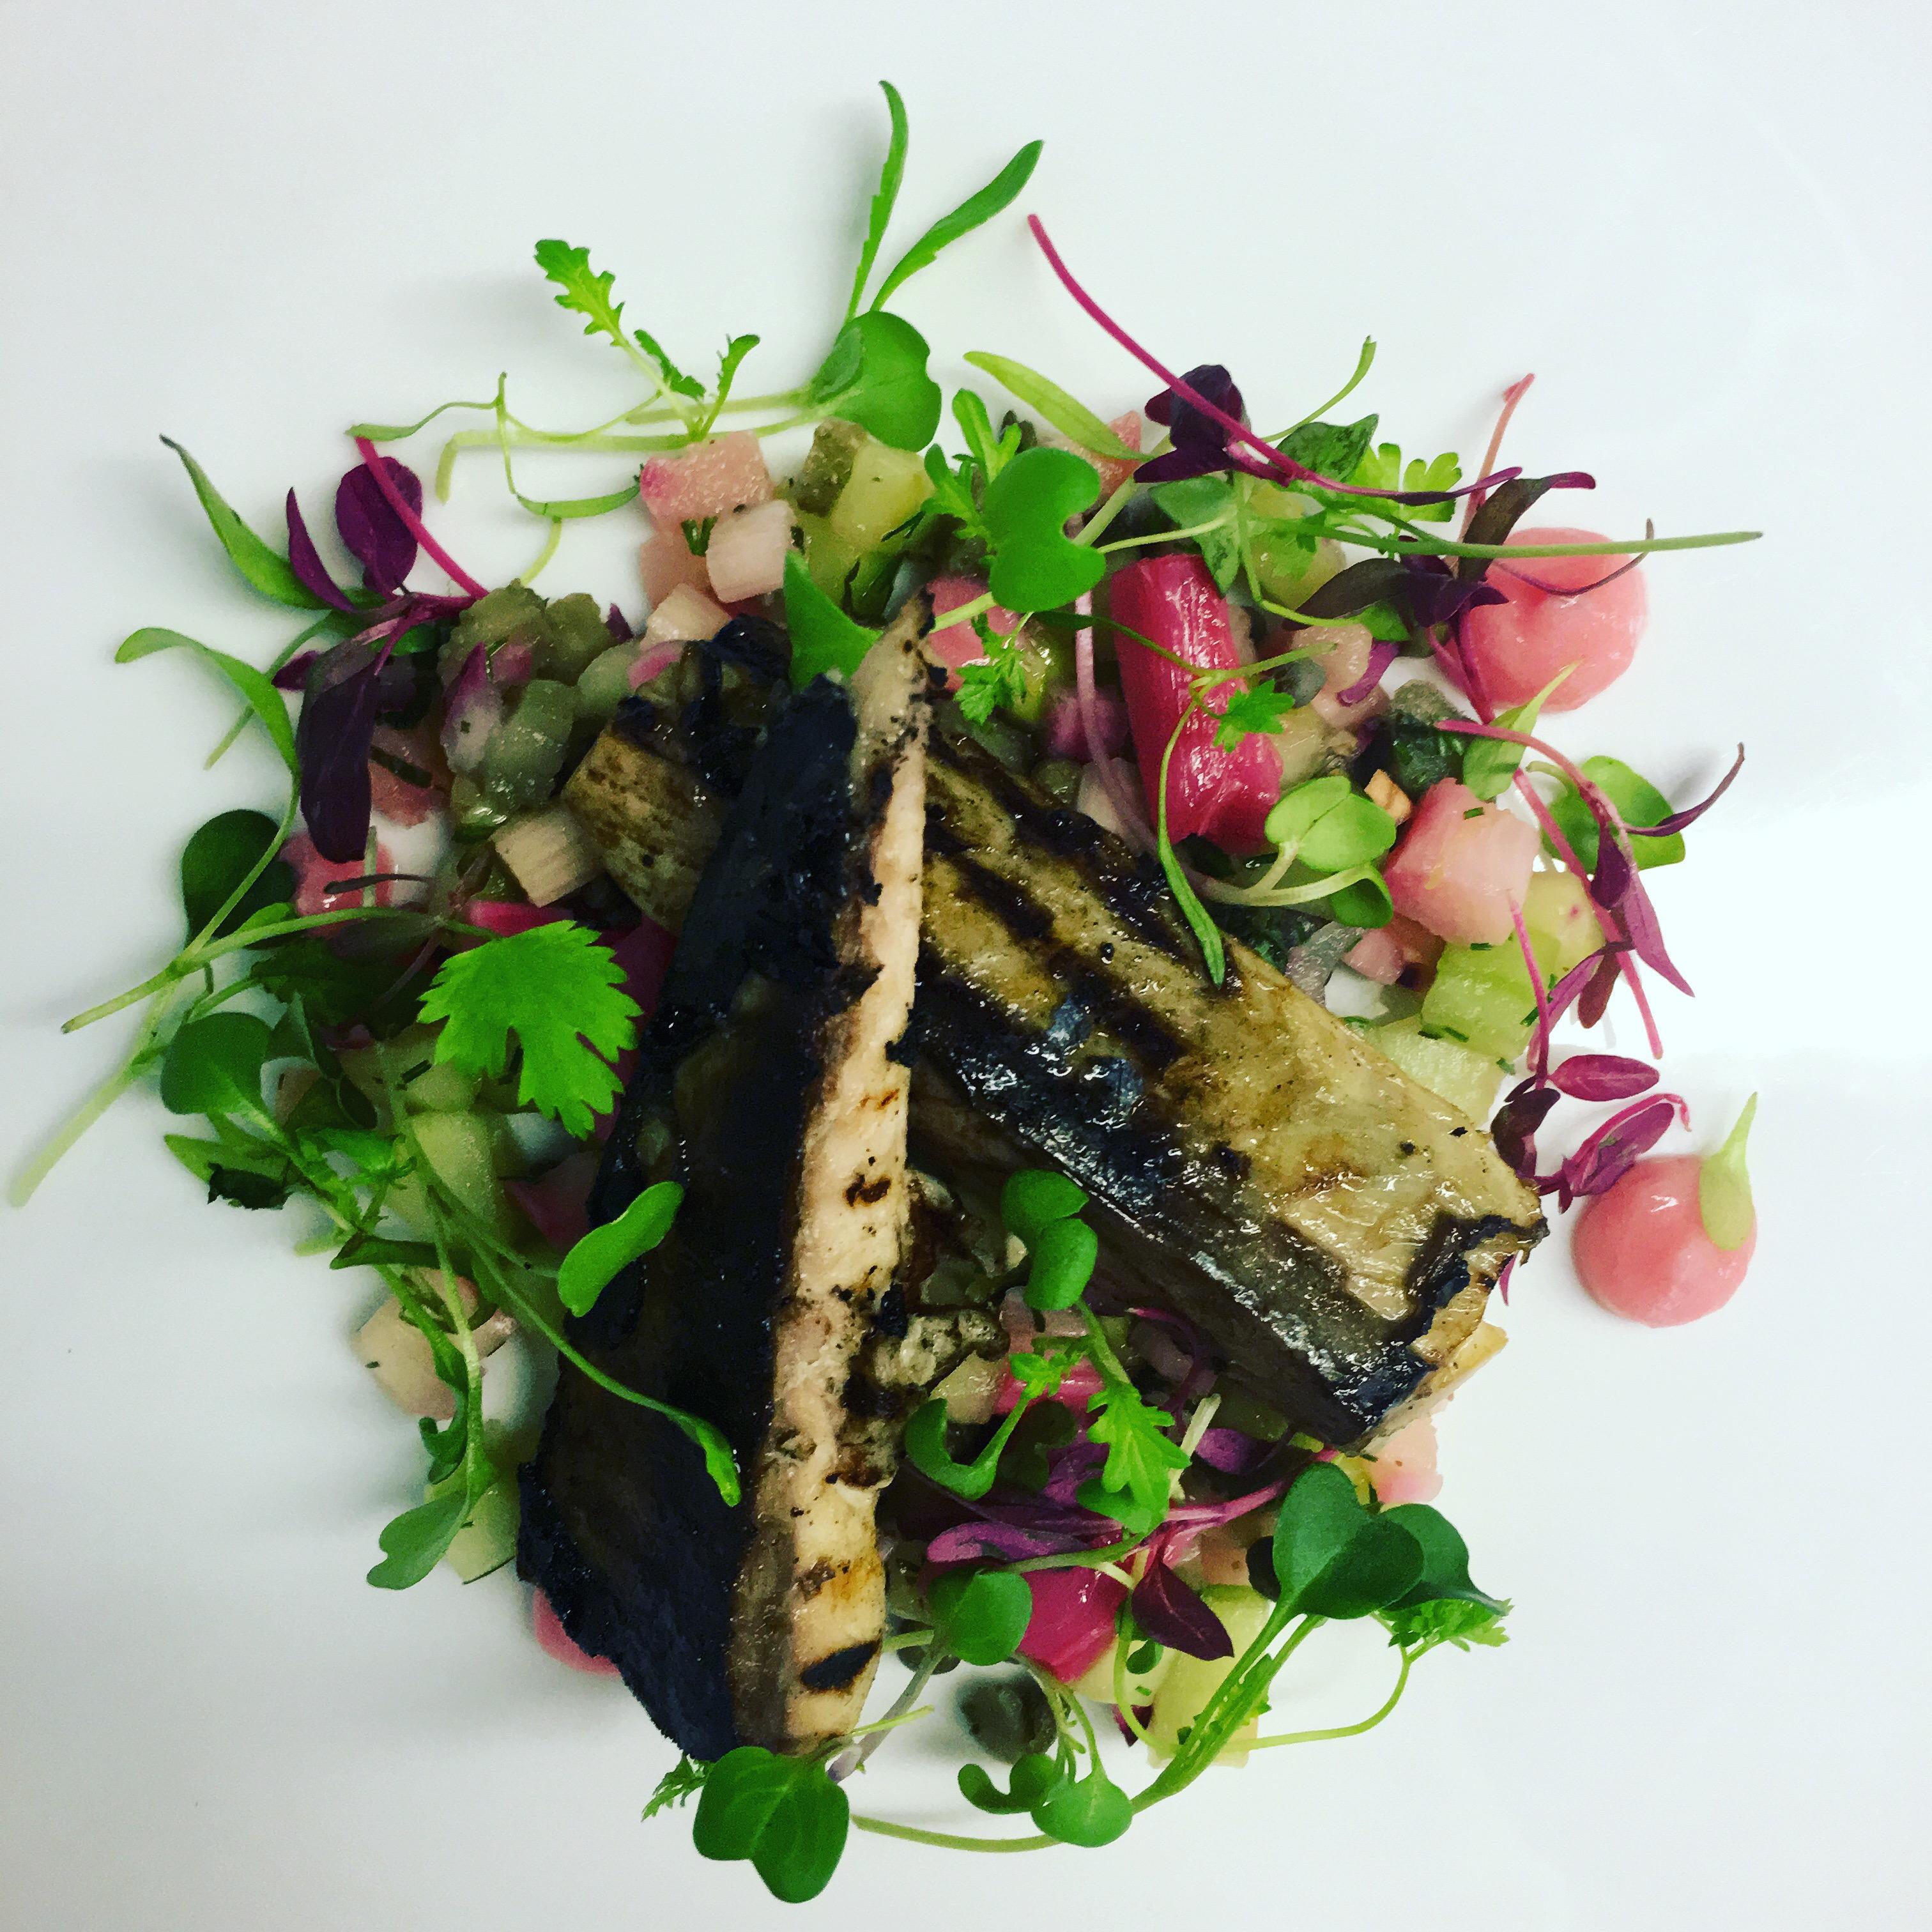 BBQ mackerel, cucumber, rhubarb and